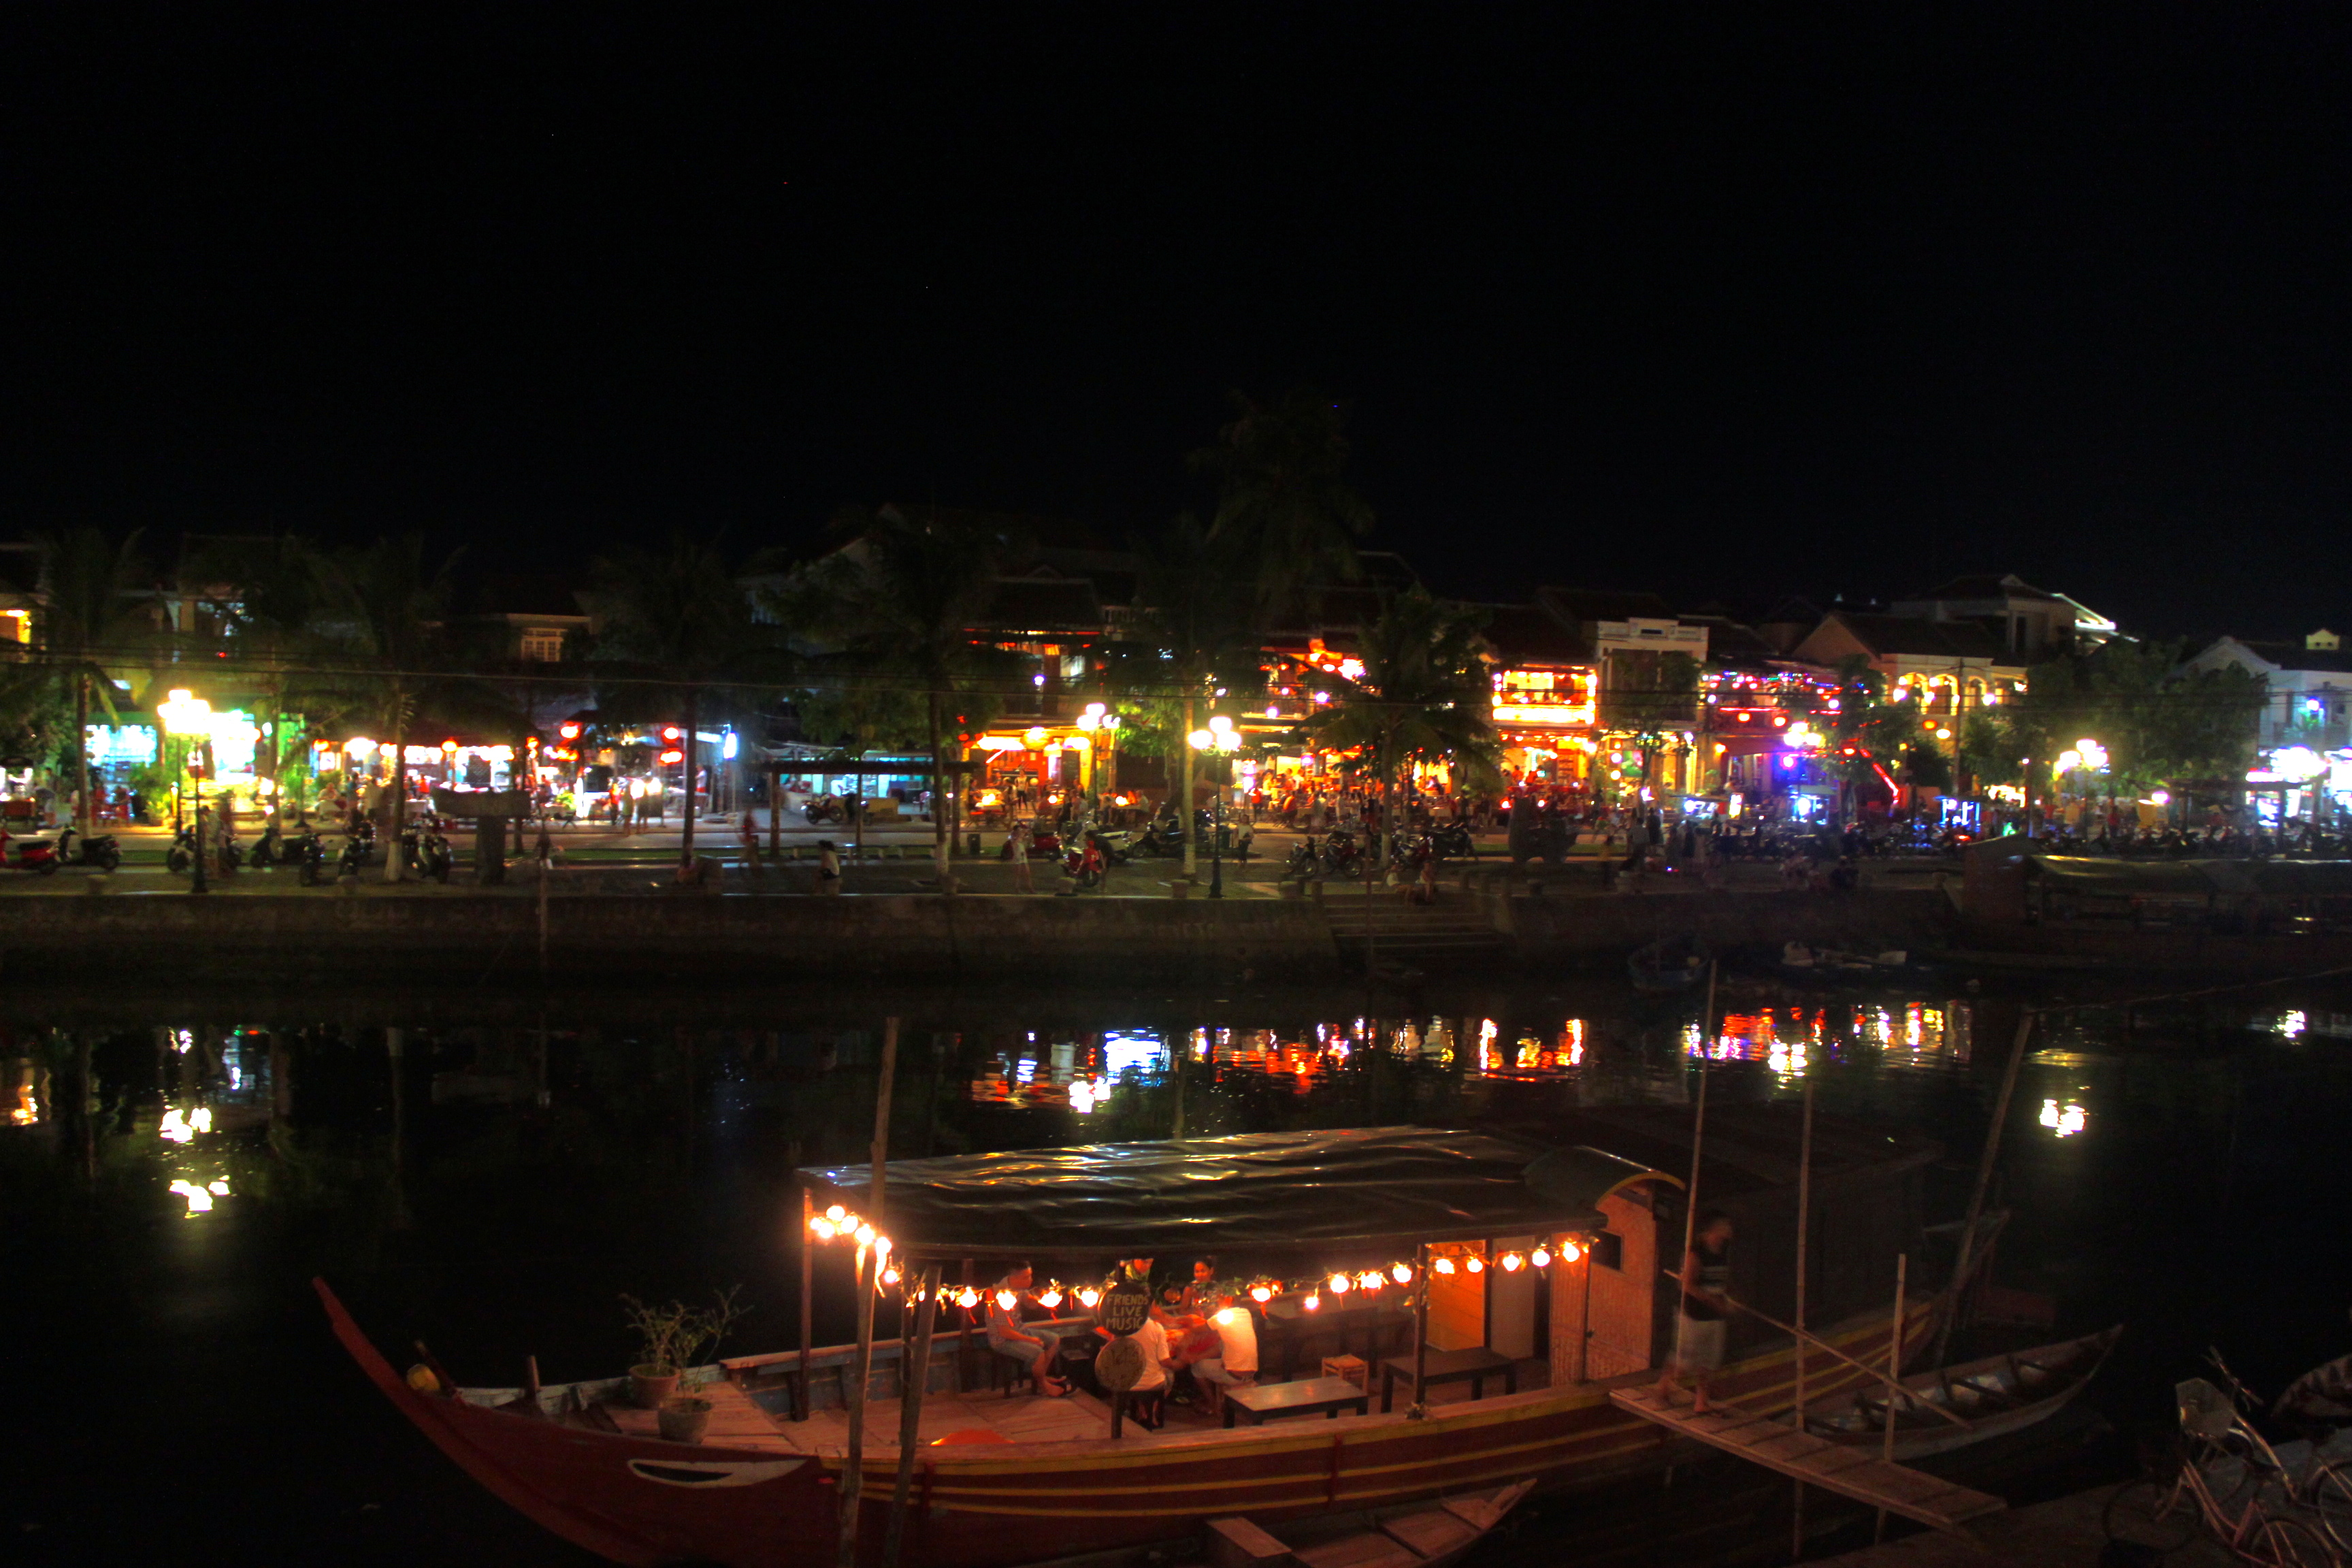 La sera a Hoi An Lugo il fiume